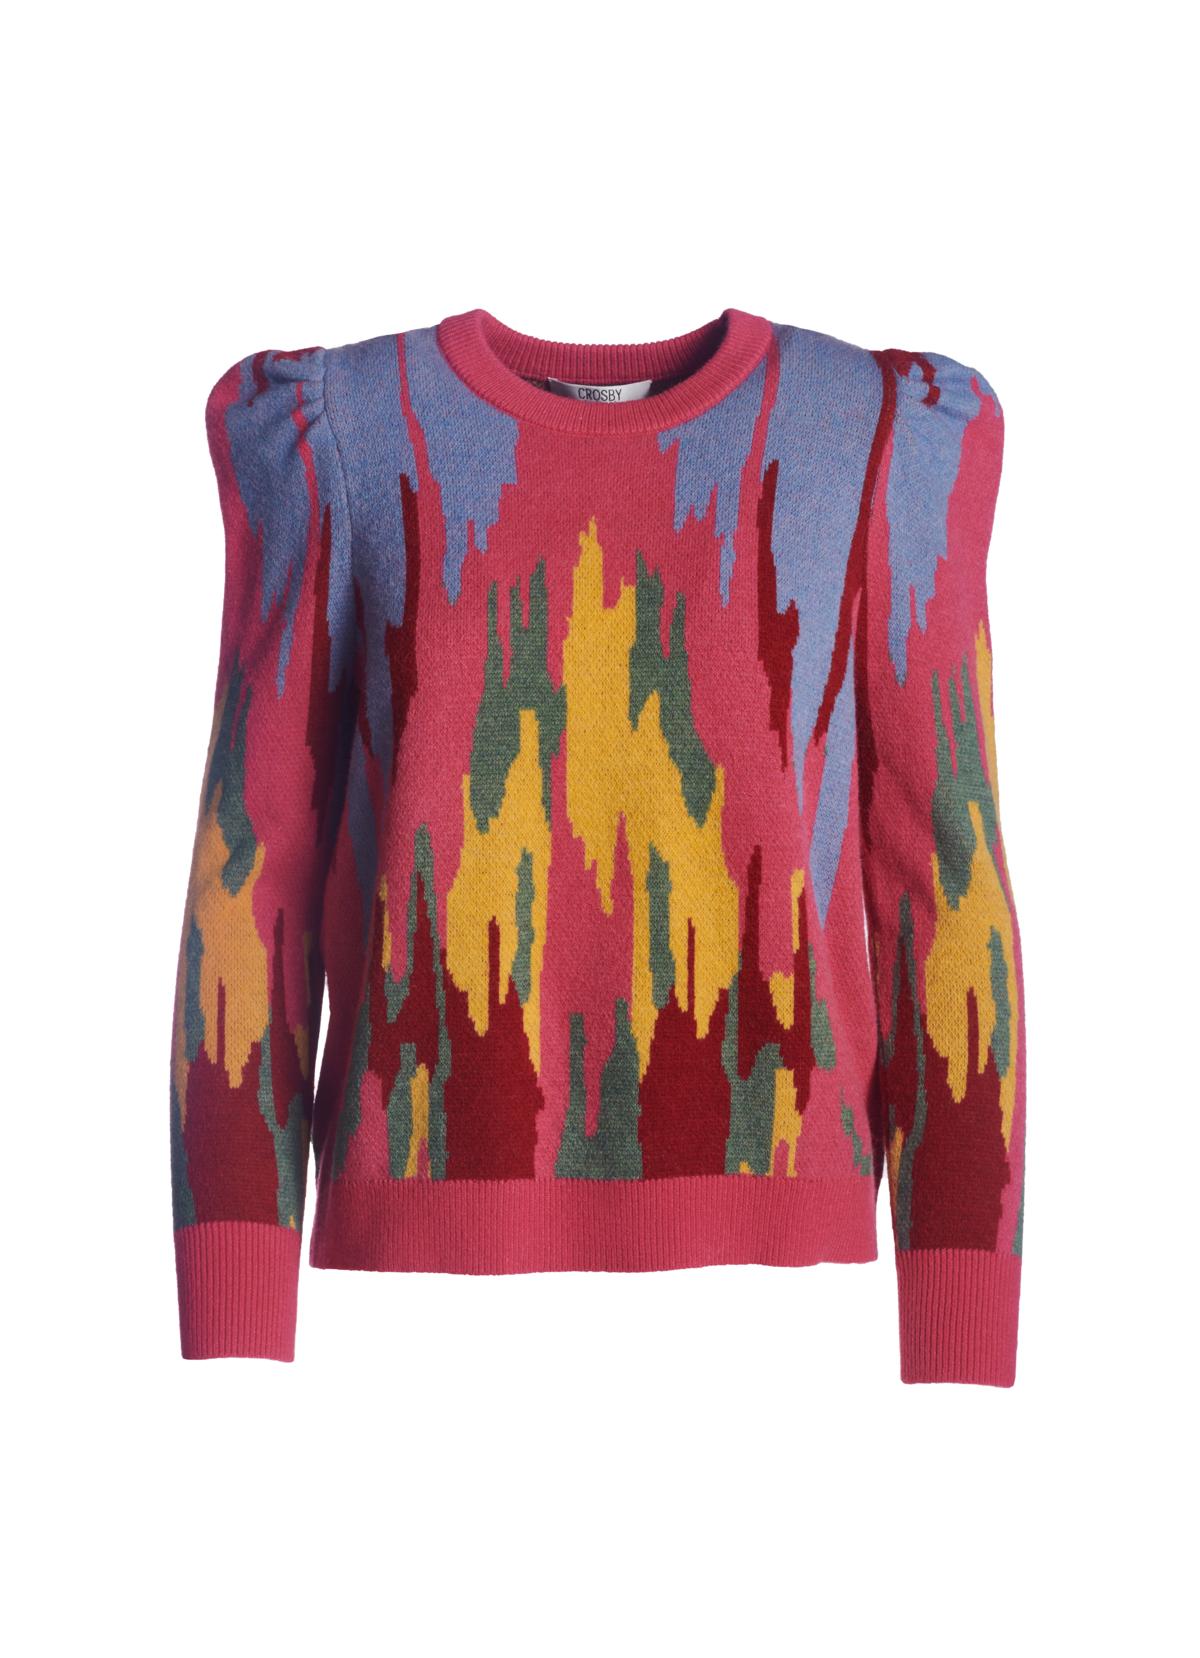 Crosby By Mollie Burch Bixby Sweater Electric Ikat